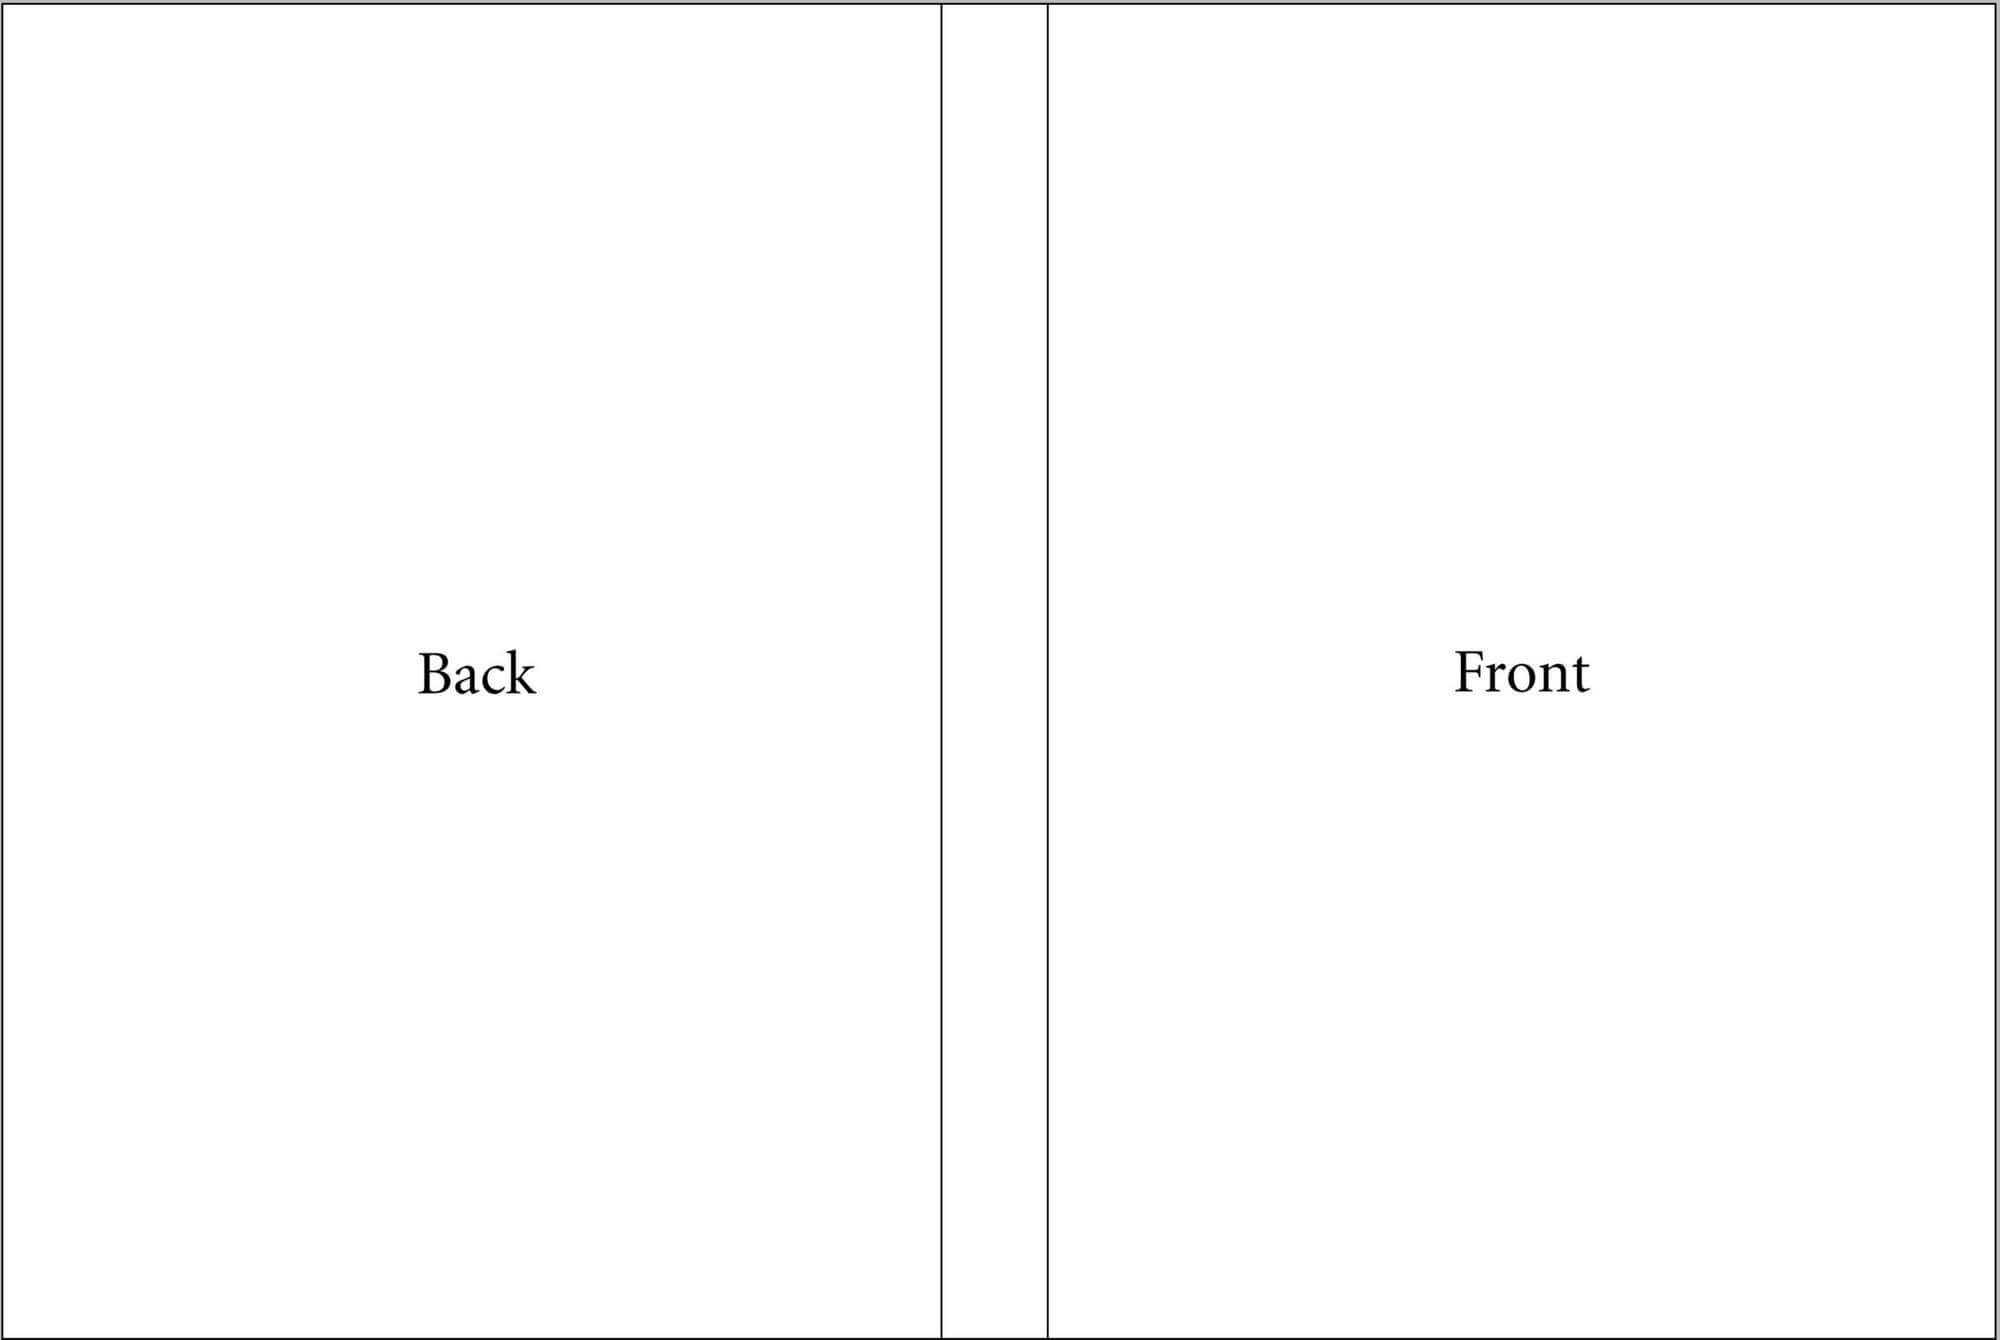 011 Dvd Cover Template 3G8Wfpik Ideas Jewel Case Insert Regarding Cd Liner Notes Template Word